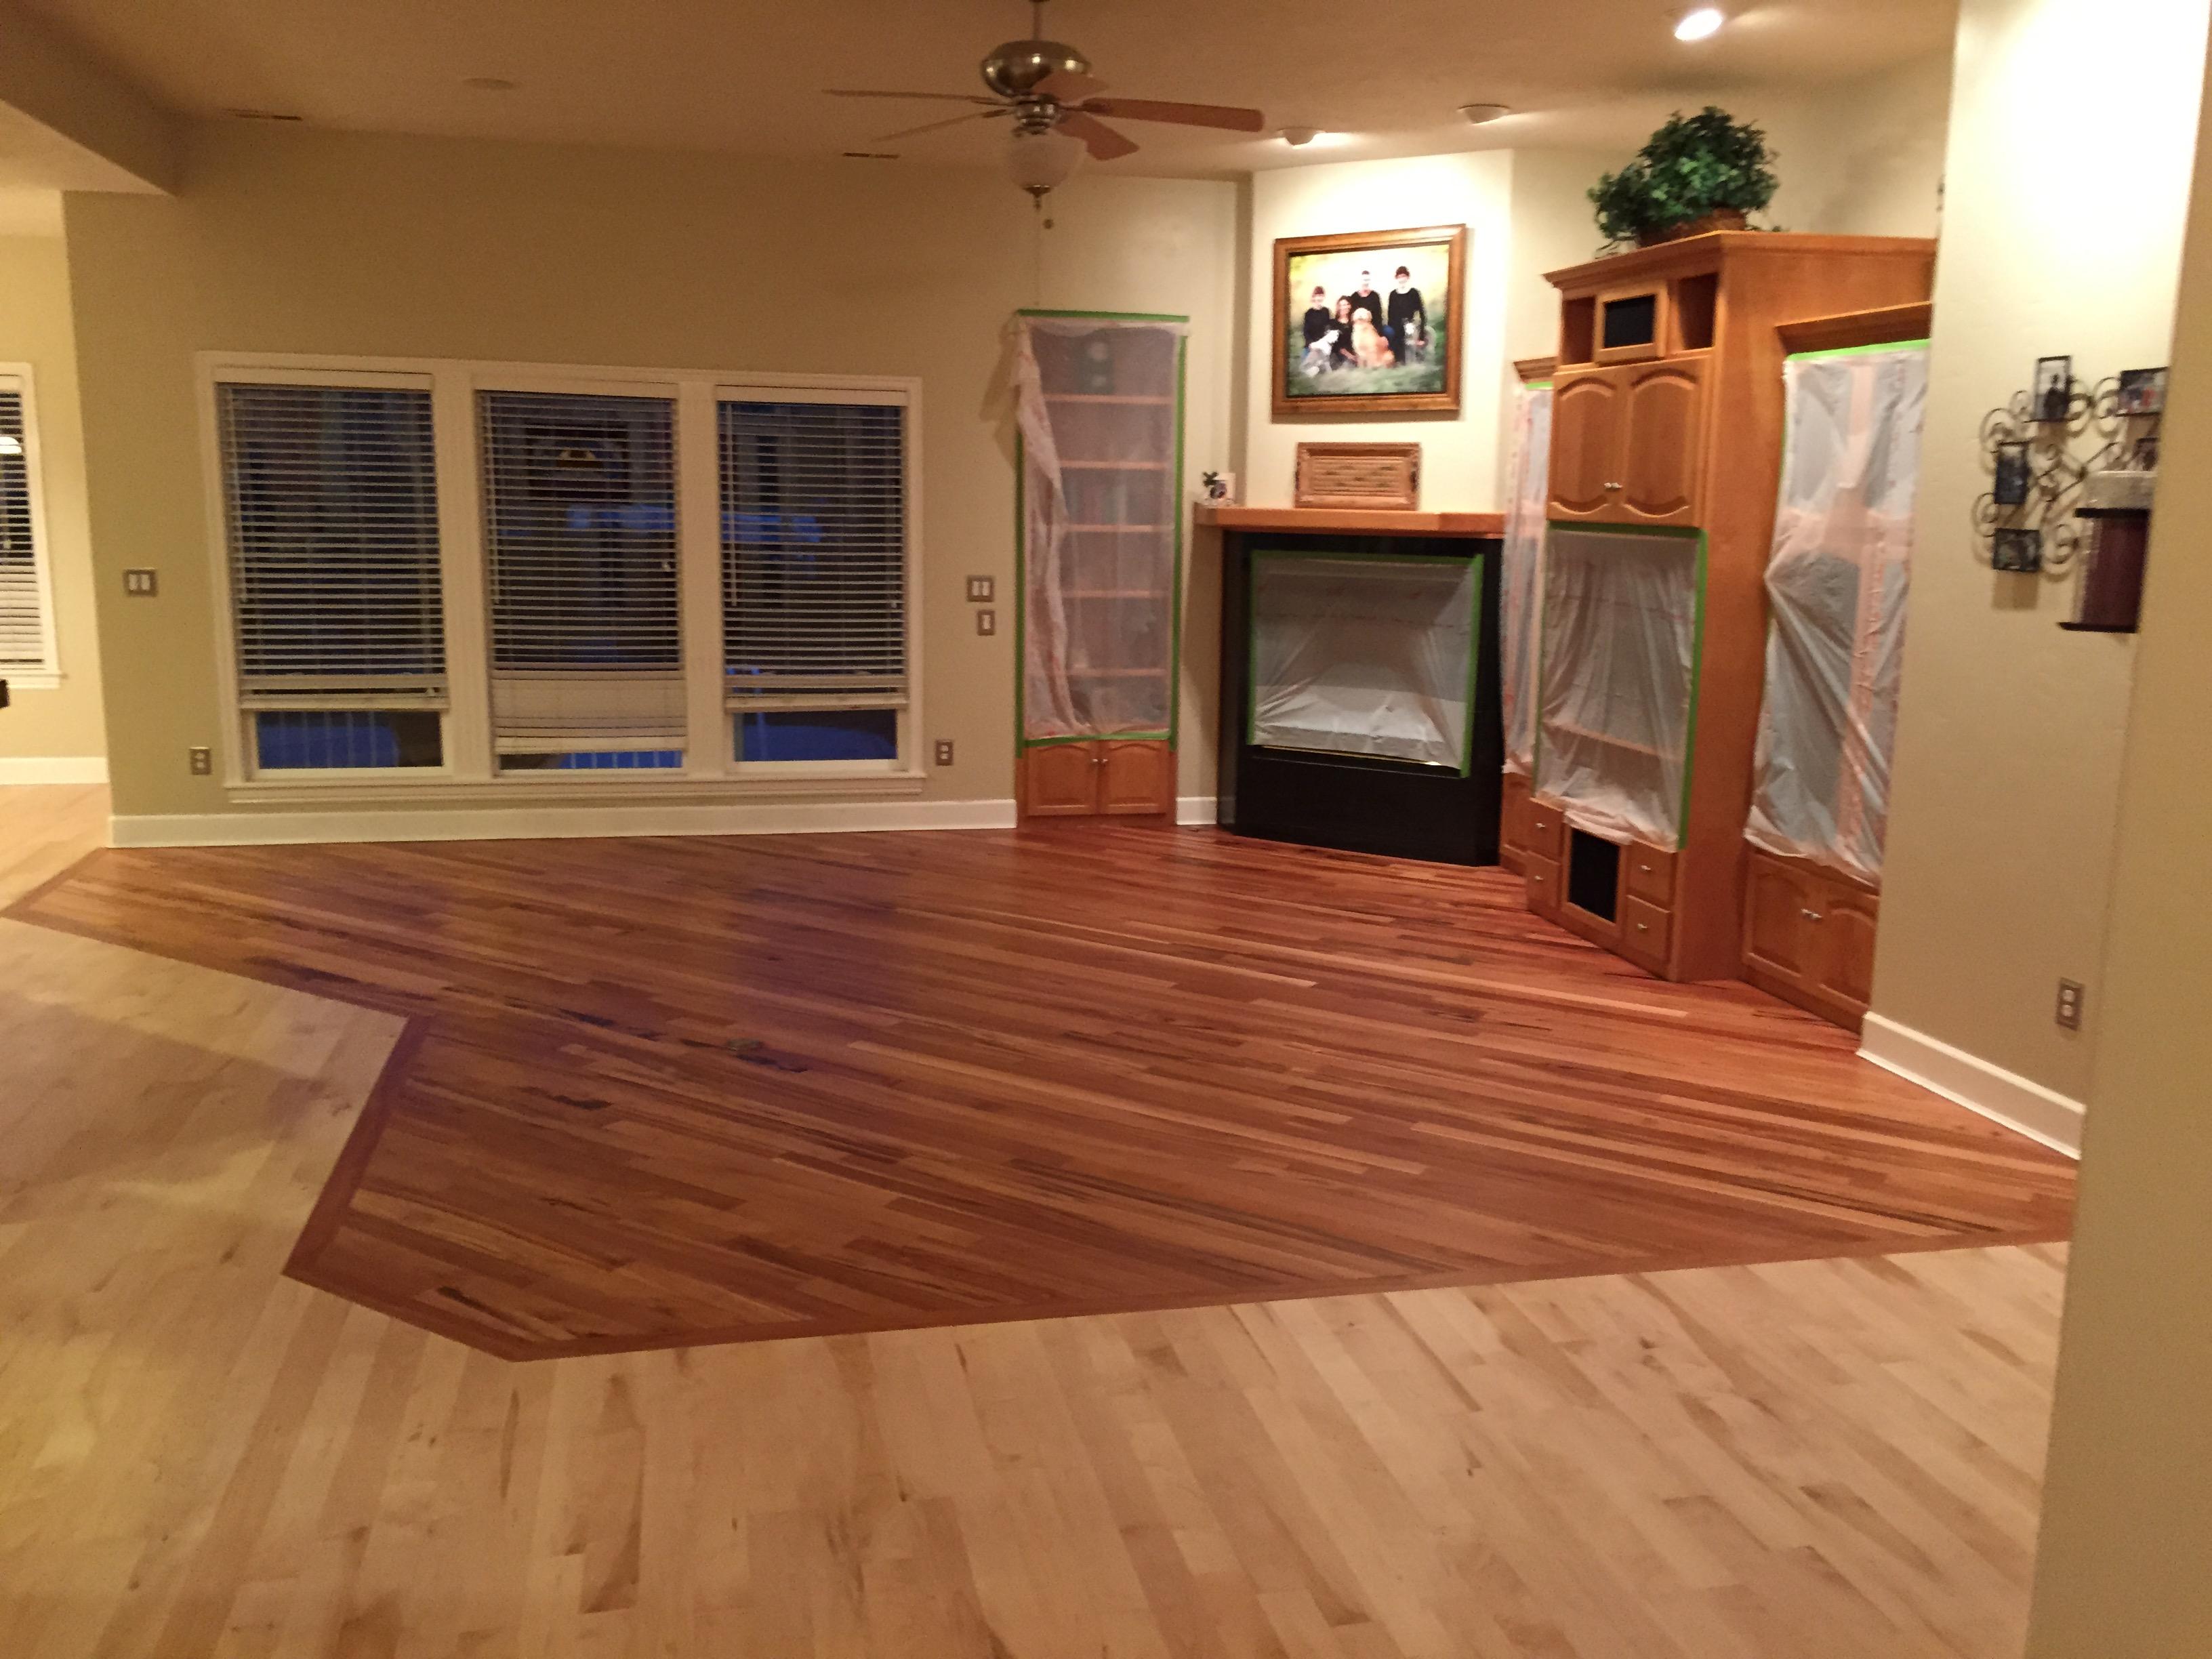 2000 Sq Ft Wood Floor Refinish in Eagle Idaho with UV